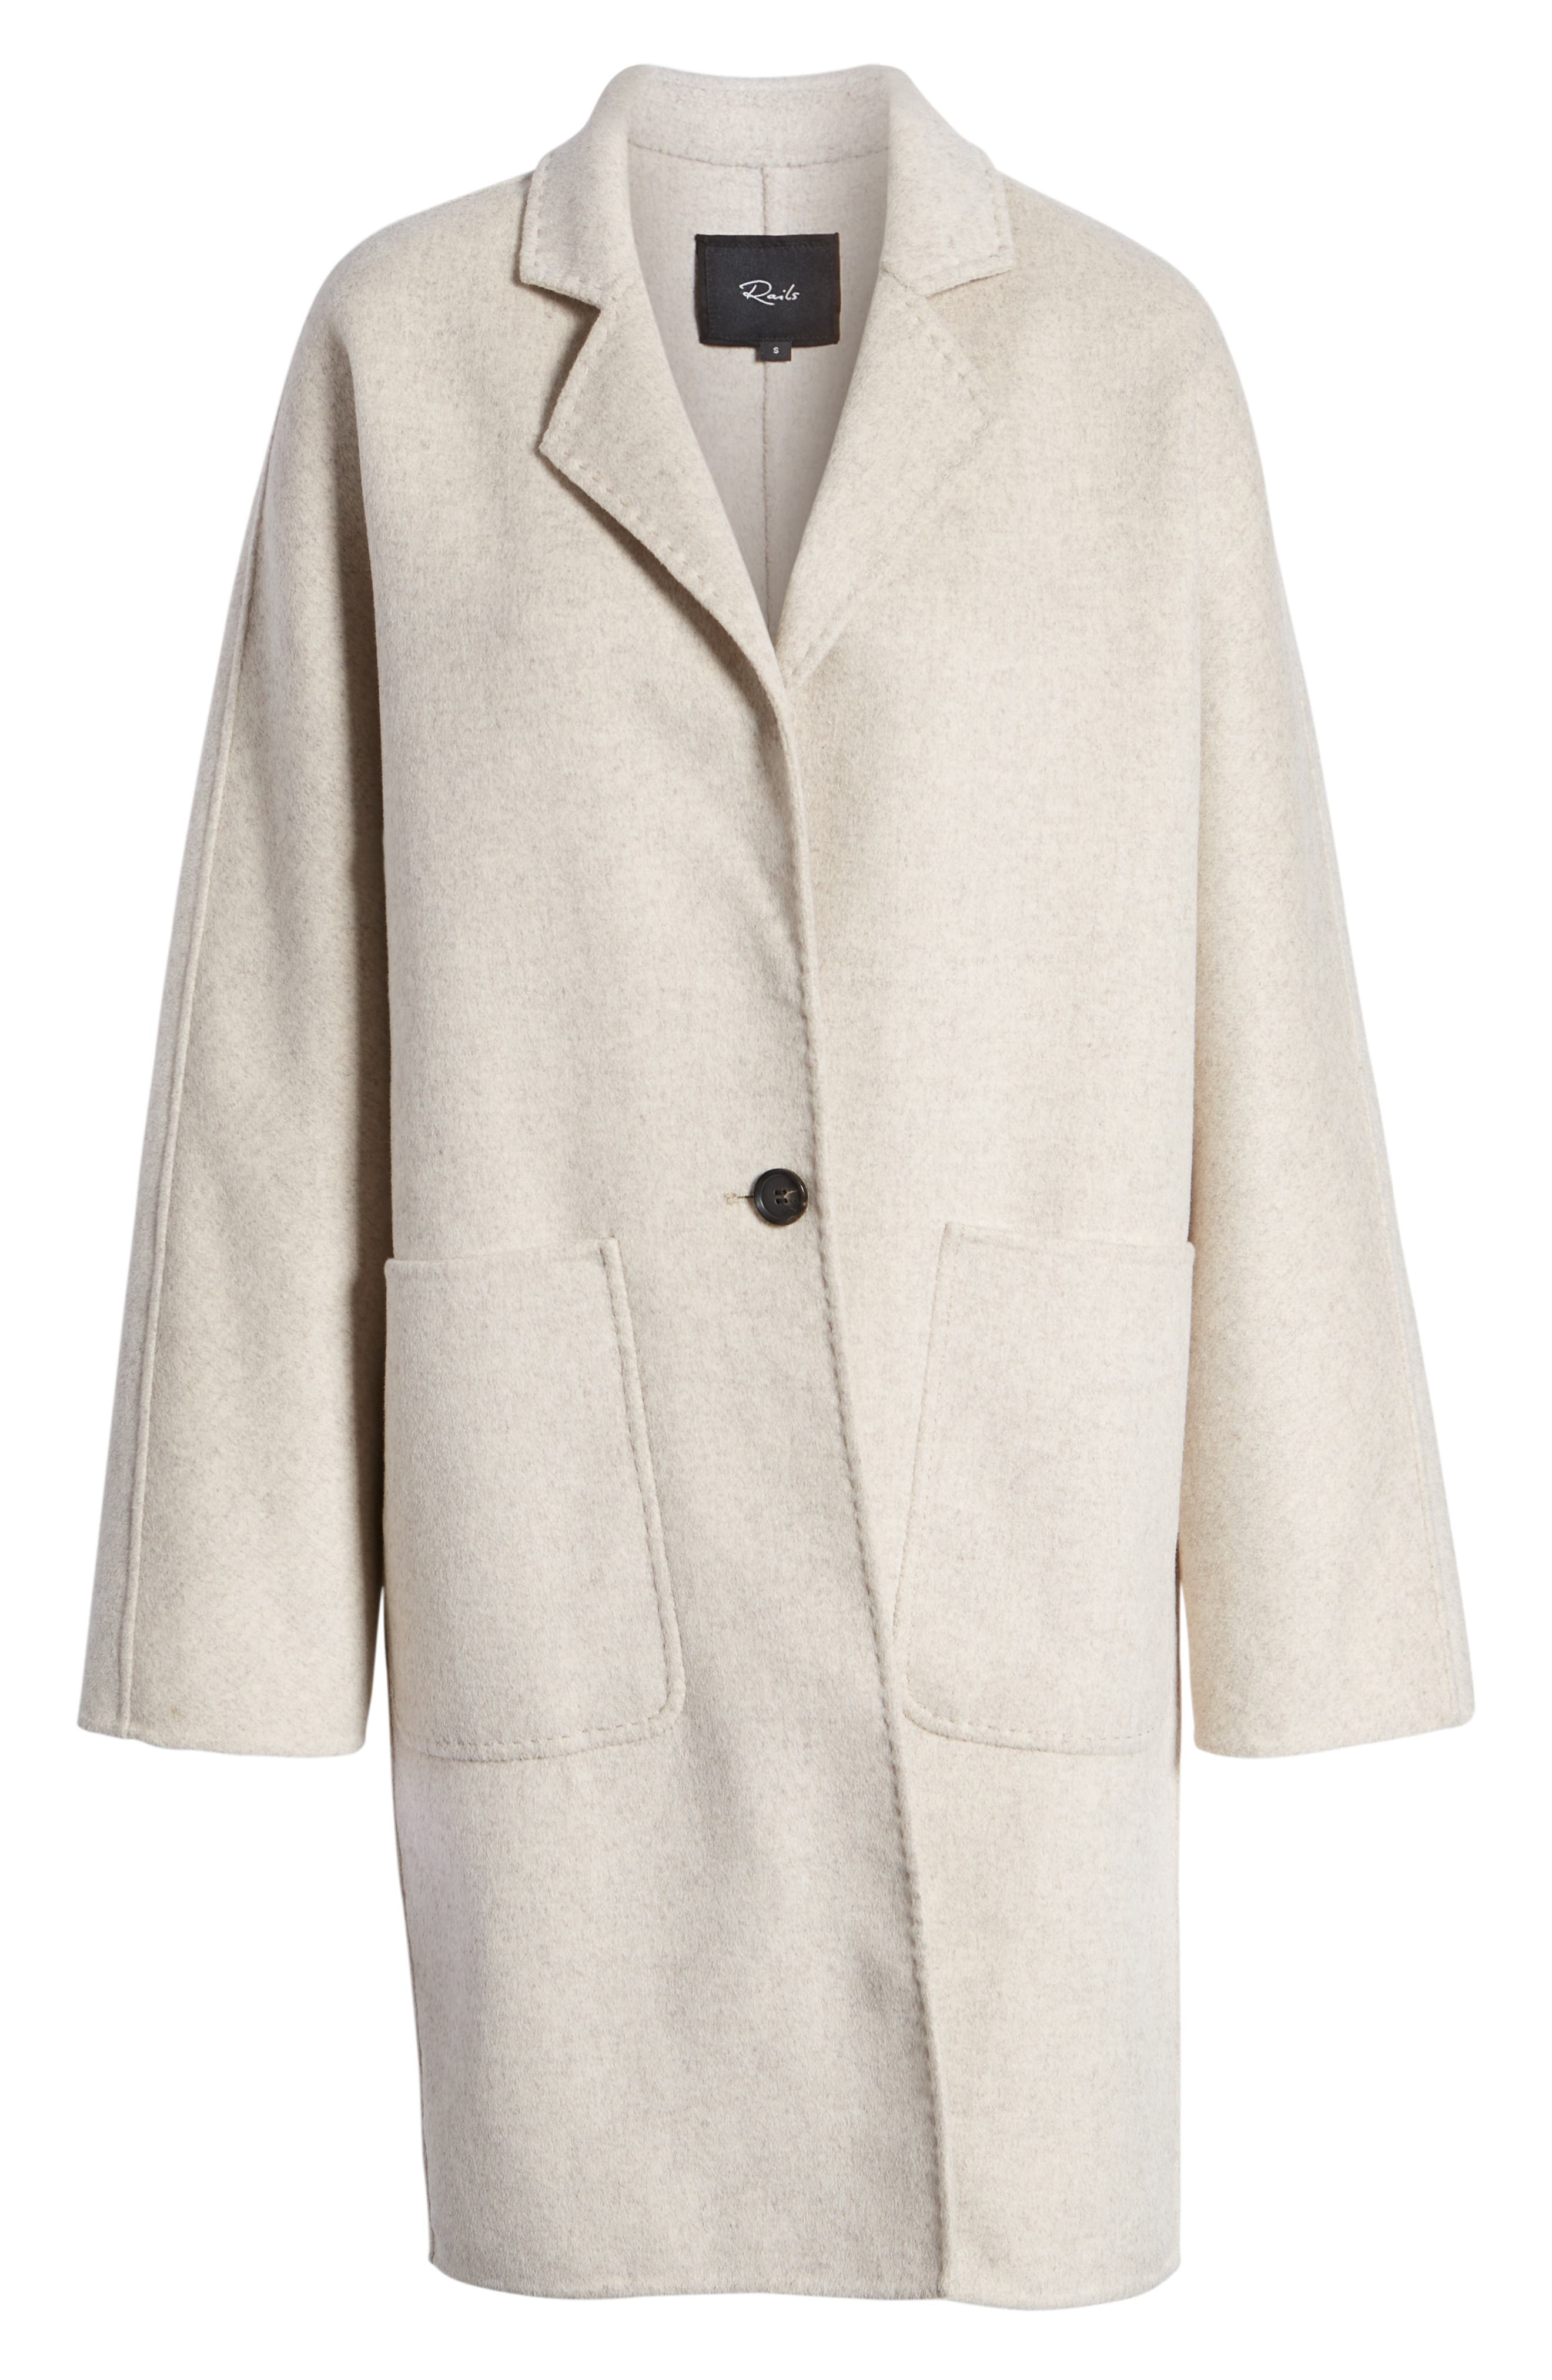 Everest Wool Blend Coat,                             Alternate thumbnail 7, color,                             OATMEAL